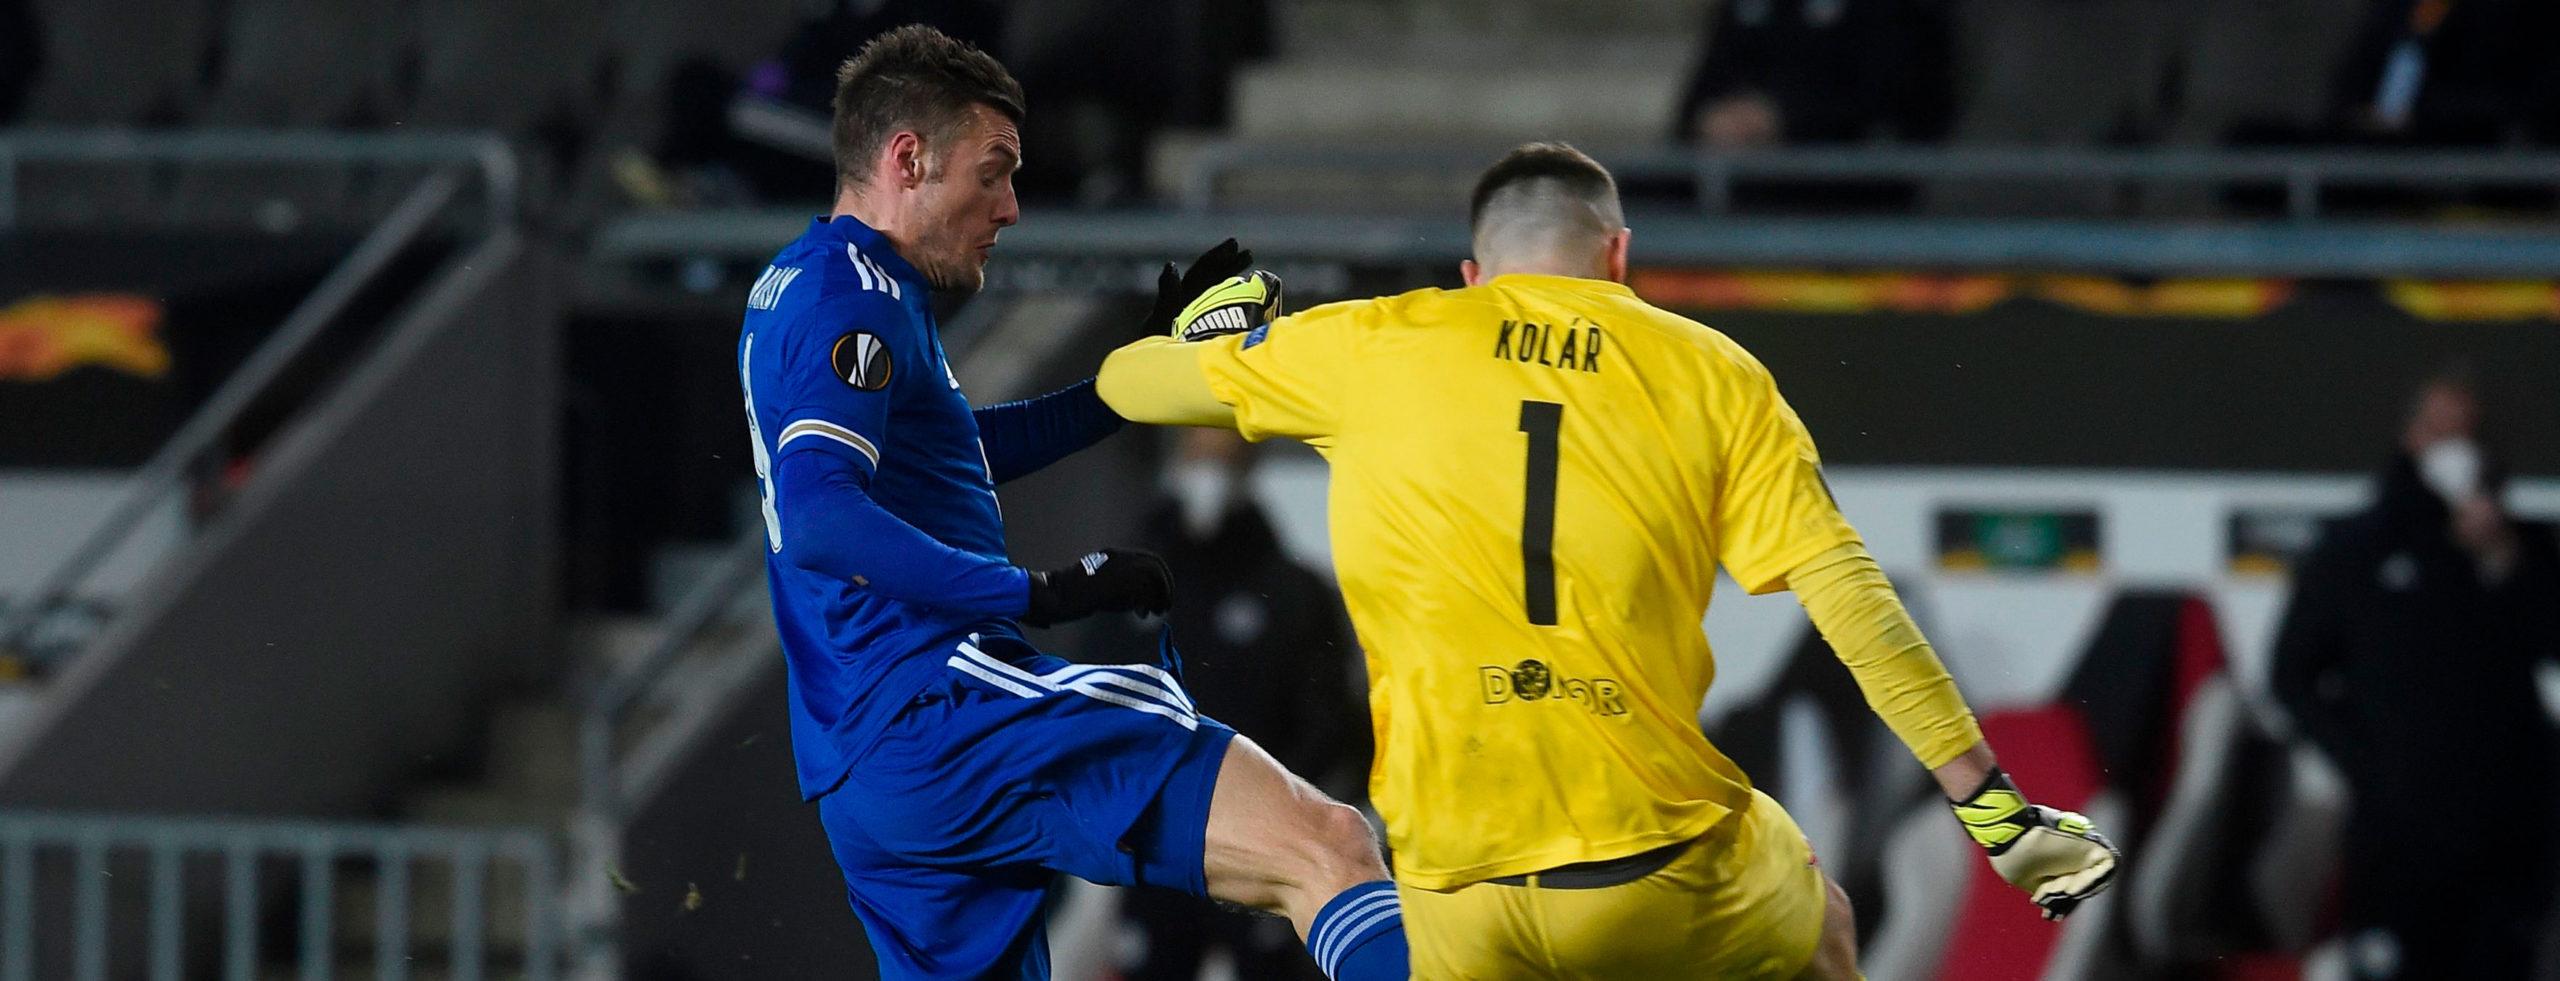 Leicester vs Slavia Prague: Foxes to take control early